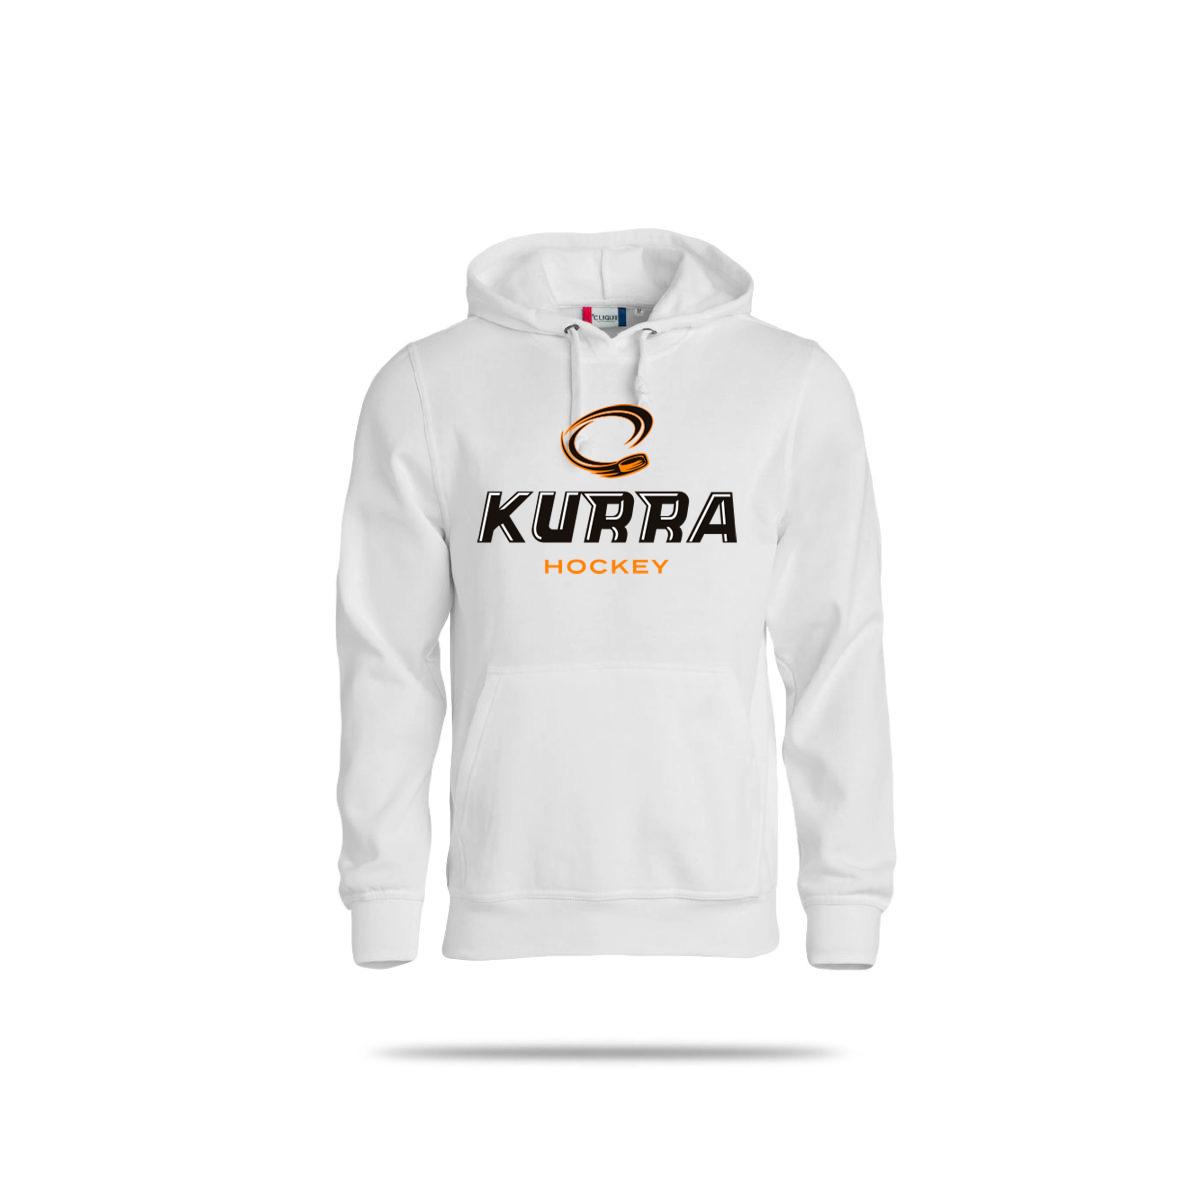 Kurra-Text-3022-valkoinen